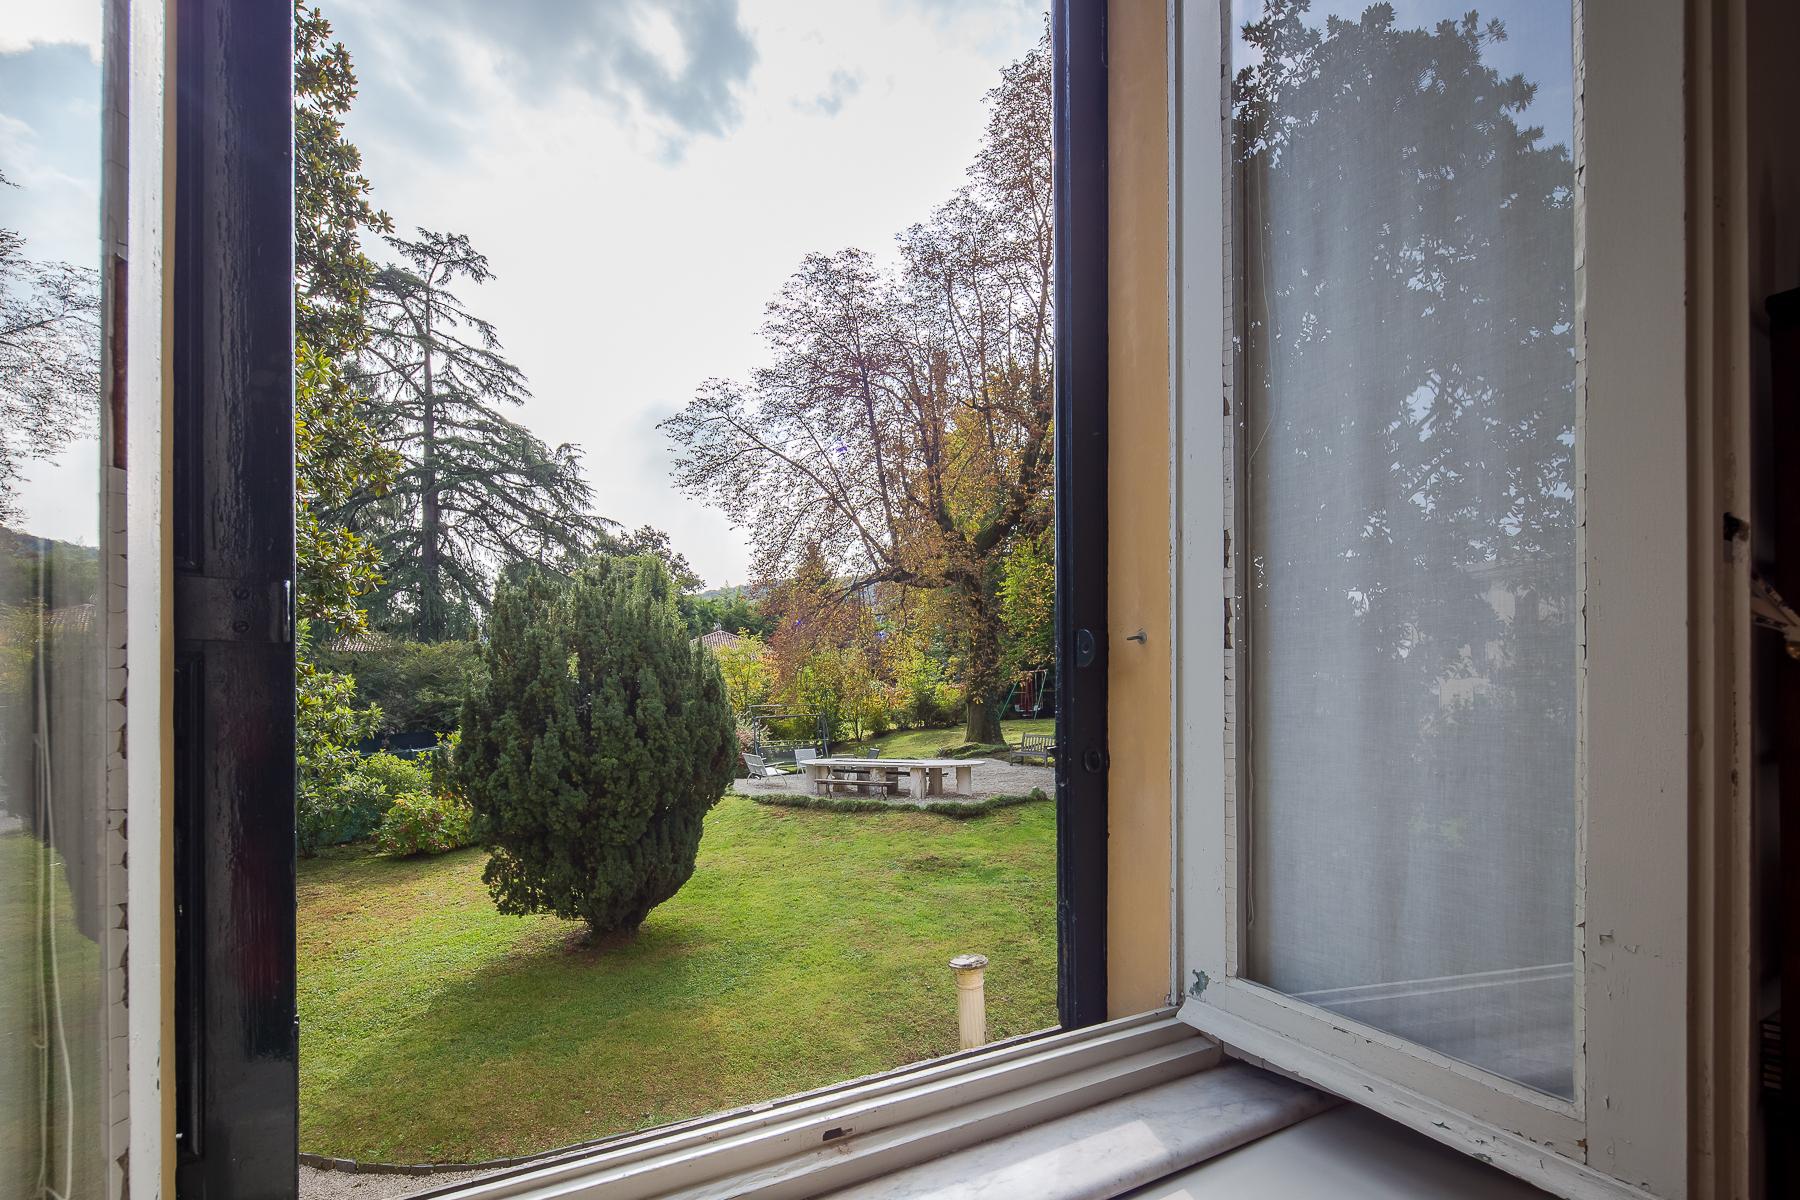 Villa in Vendita a Stresa: 5 locali, 740 mq - Foto 12